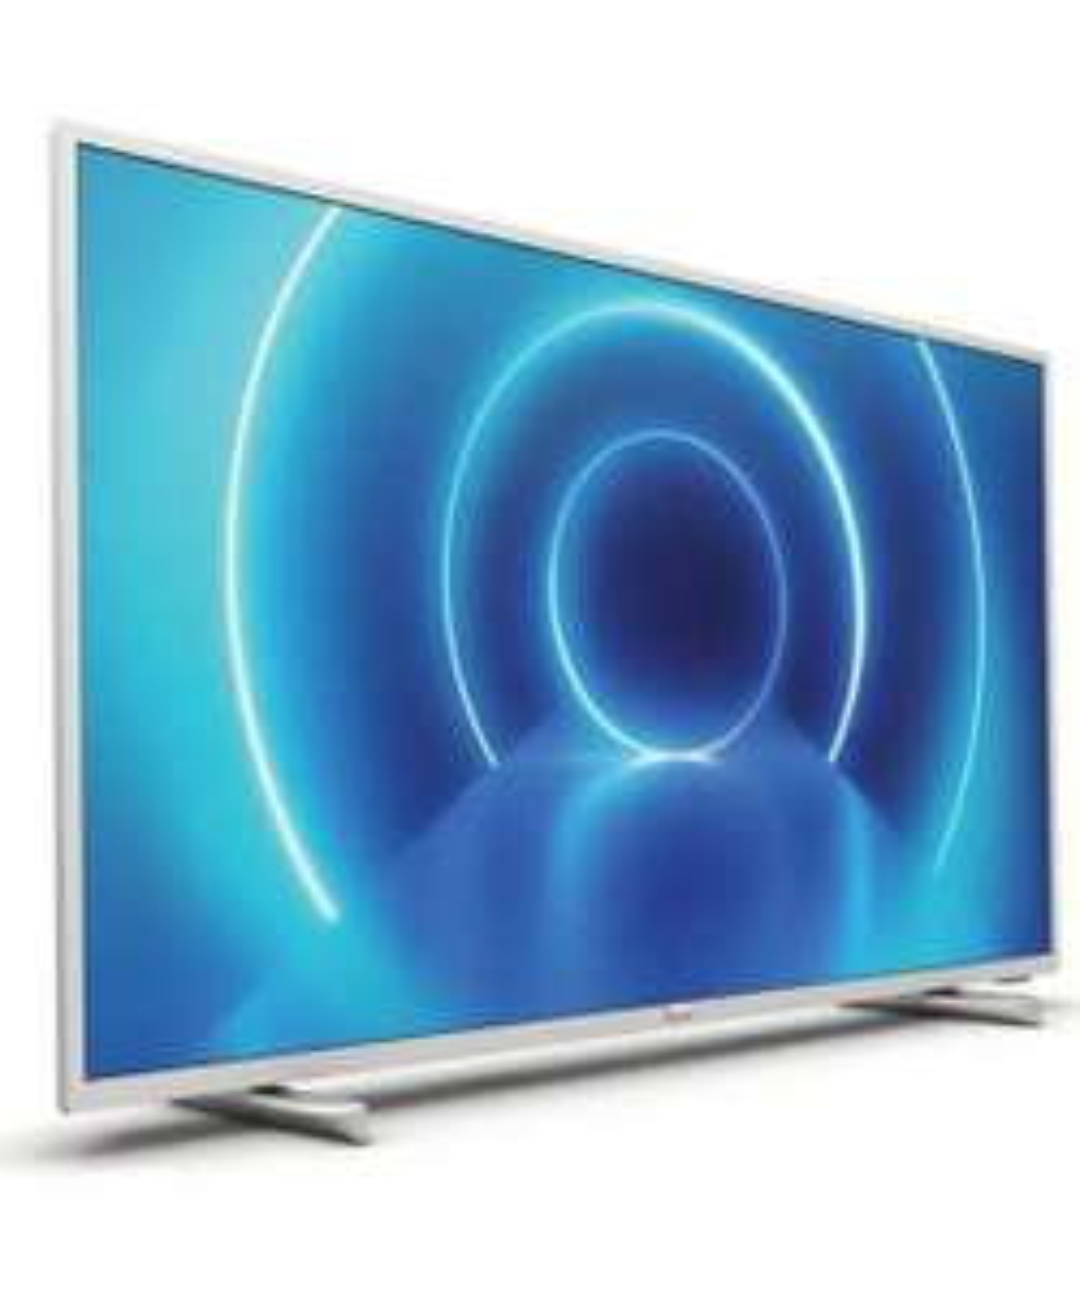 "[CDAV] TV LED 50"" Philips 50PUS7555/12 - 4K UHD, HDR 10+, Dolby Vision & Atmos, Smart TV"